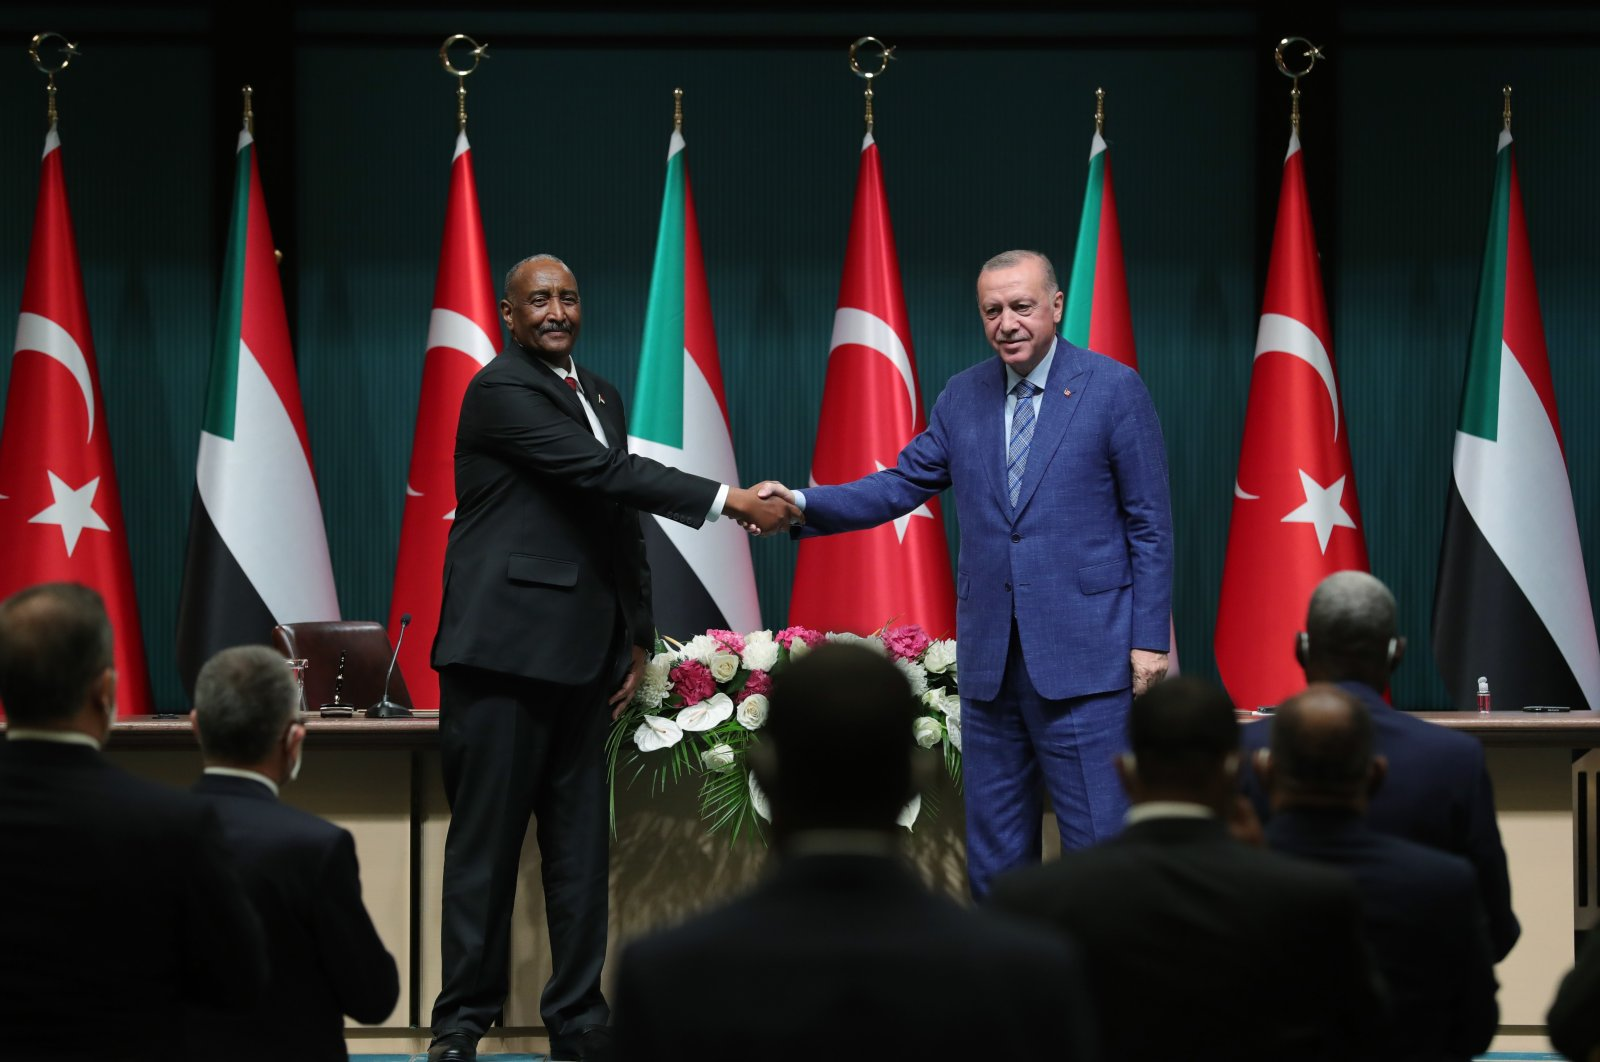 President Recep Tayyip Erdoğan (R) shakes hands with Abdel Fattah al-Burhan, the chairperson of Sudan's Sovereign Council, following their meeting in the capital Ankara, Turkey, Aug. 12, 2021. (AA Photo)